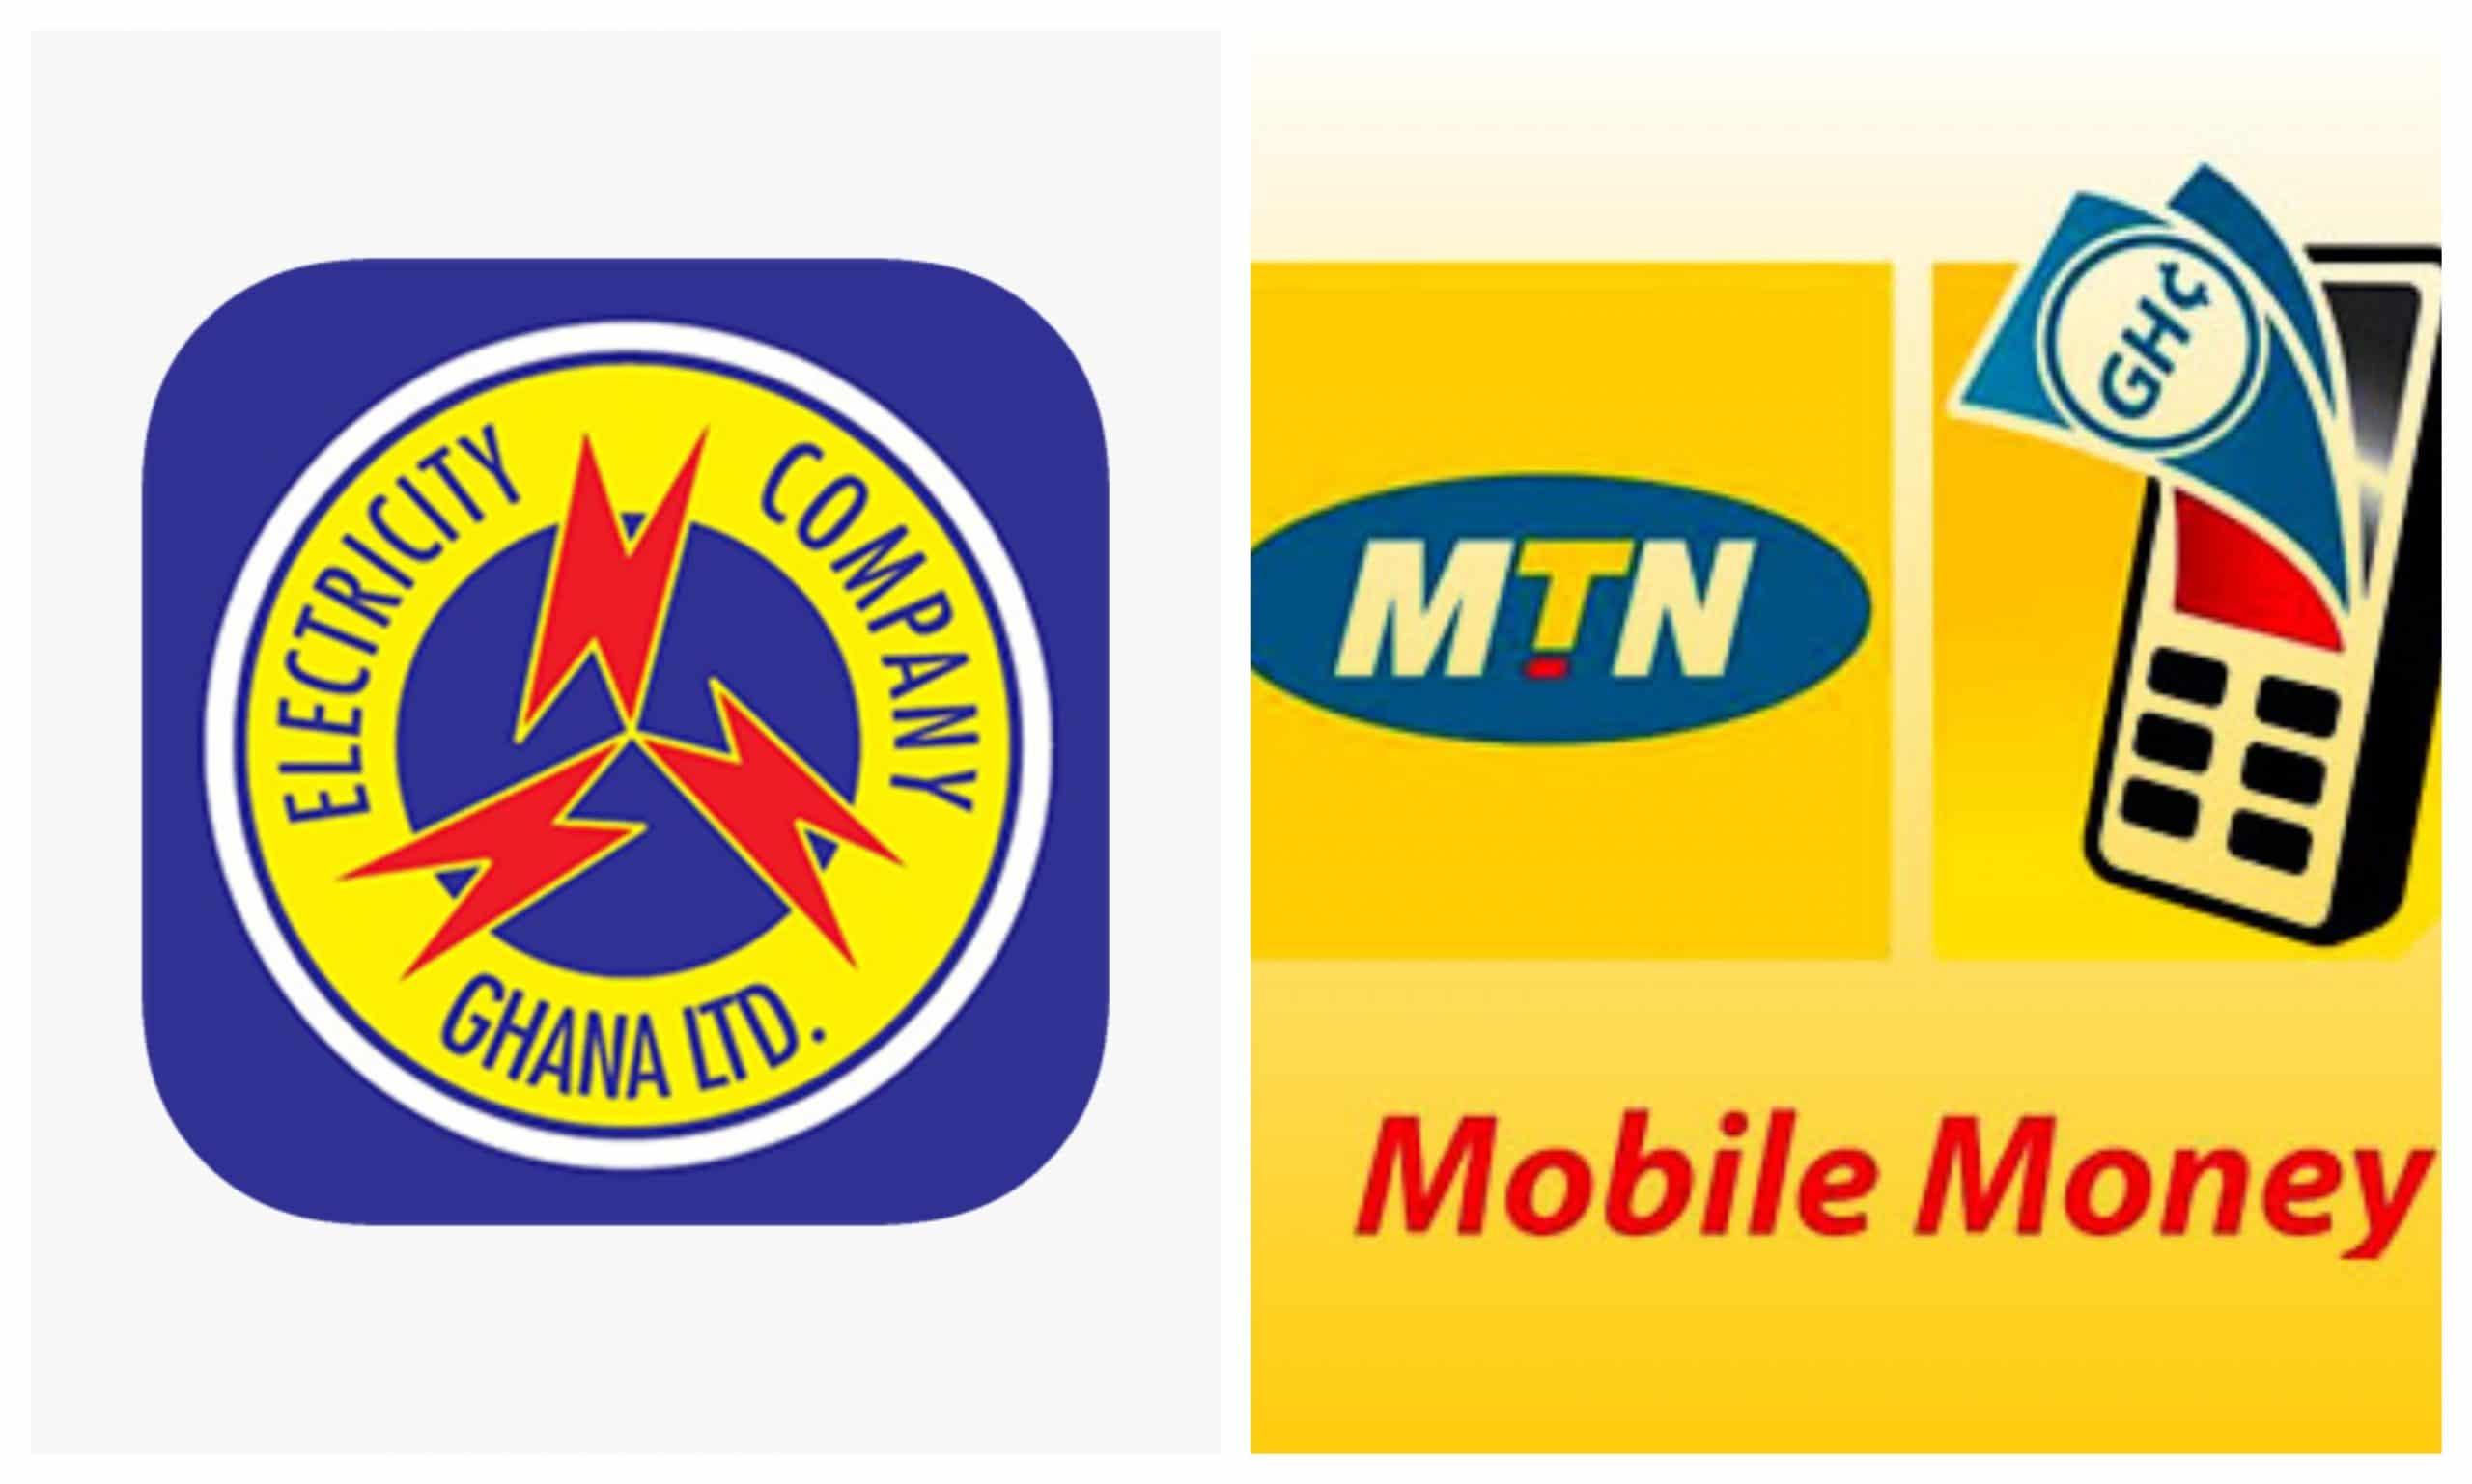 ecg prepaid mobile money